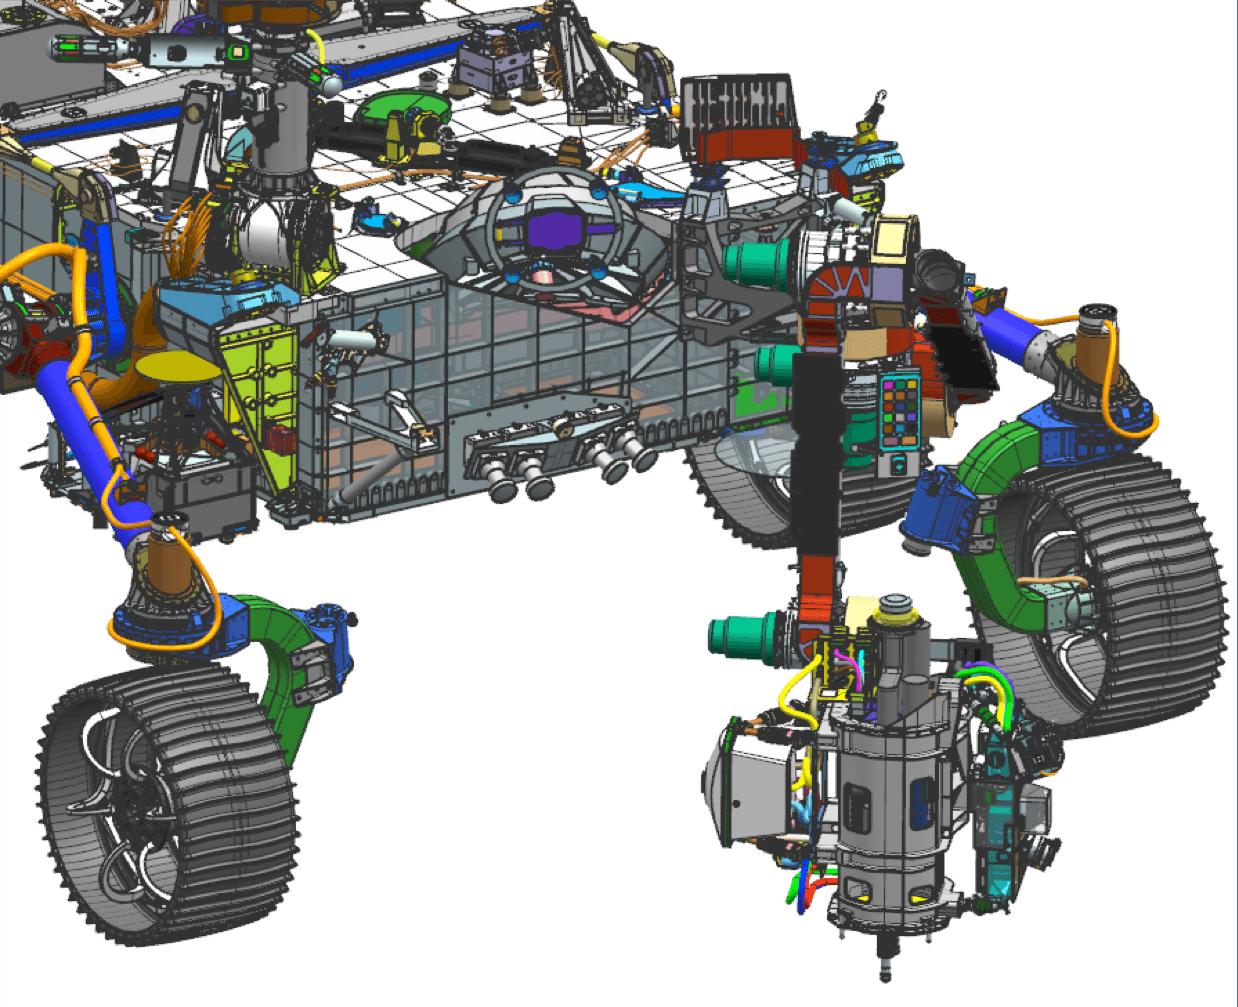 Mars 2020 Rover with SHERLOC